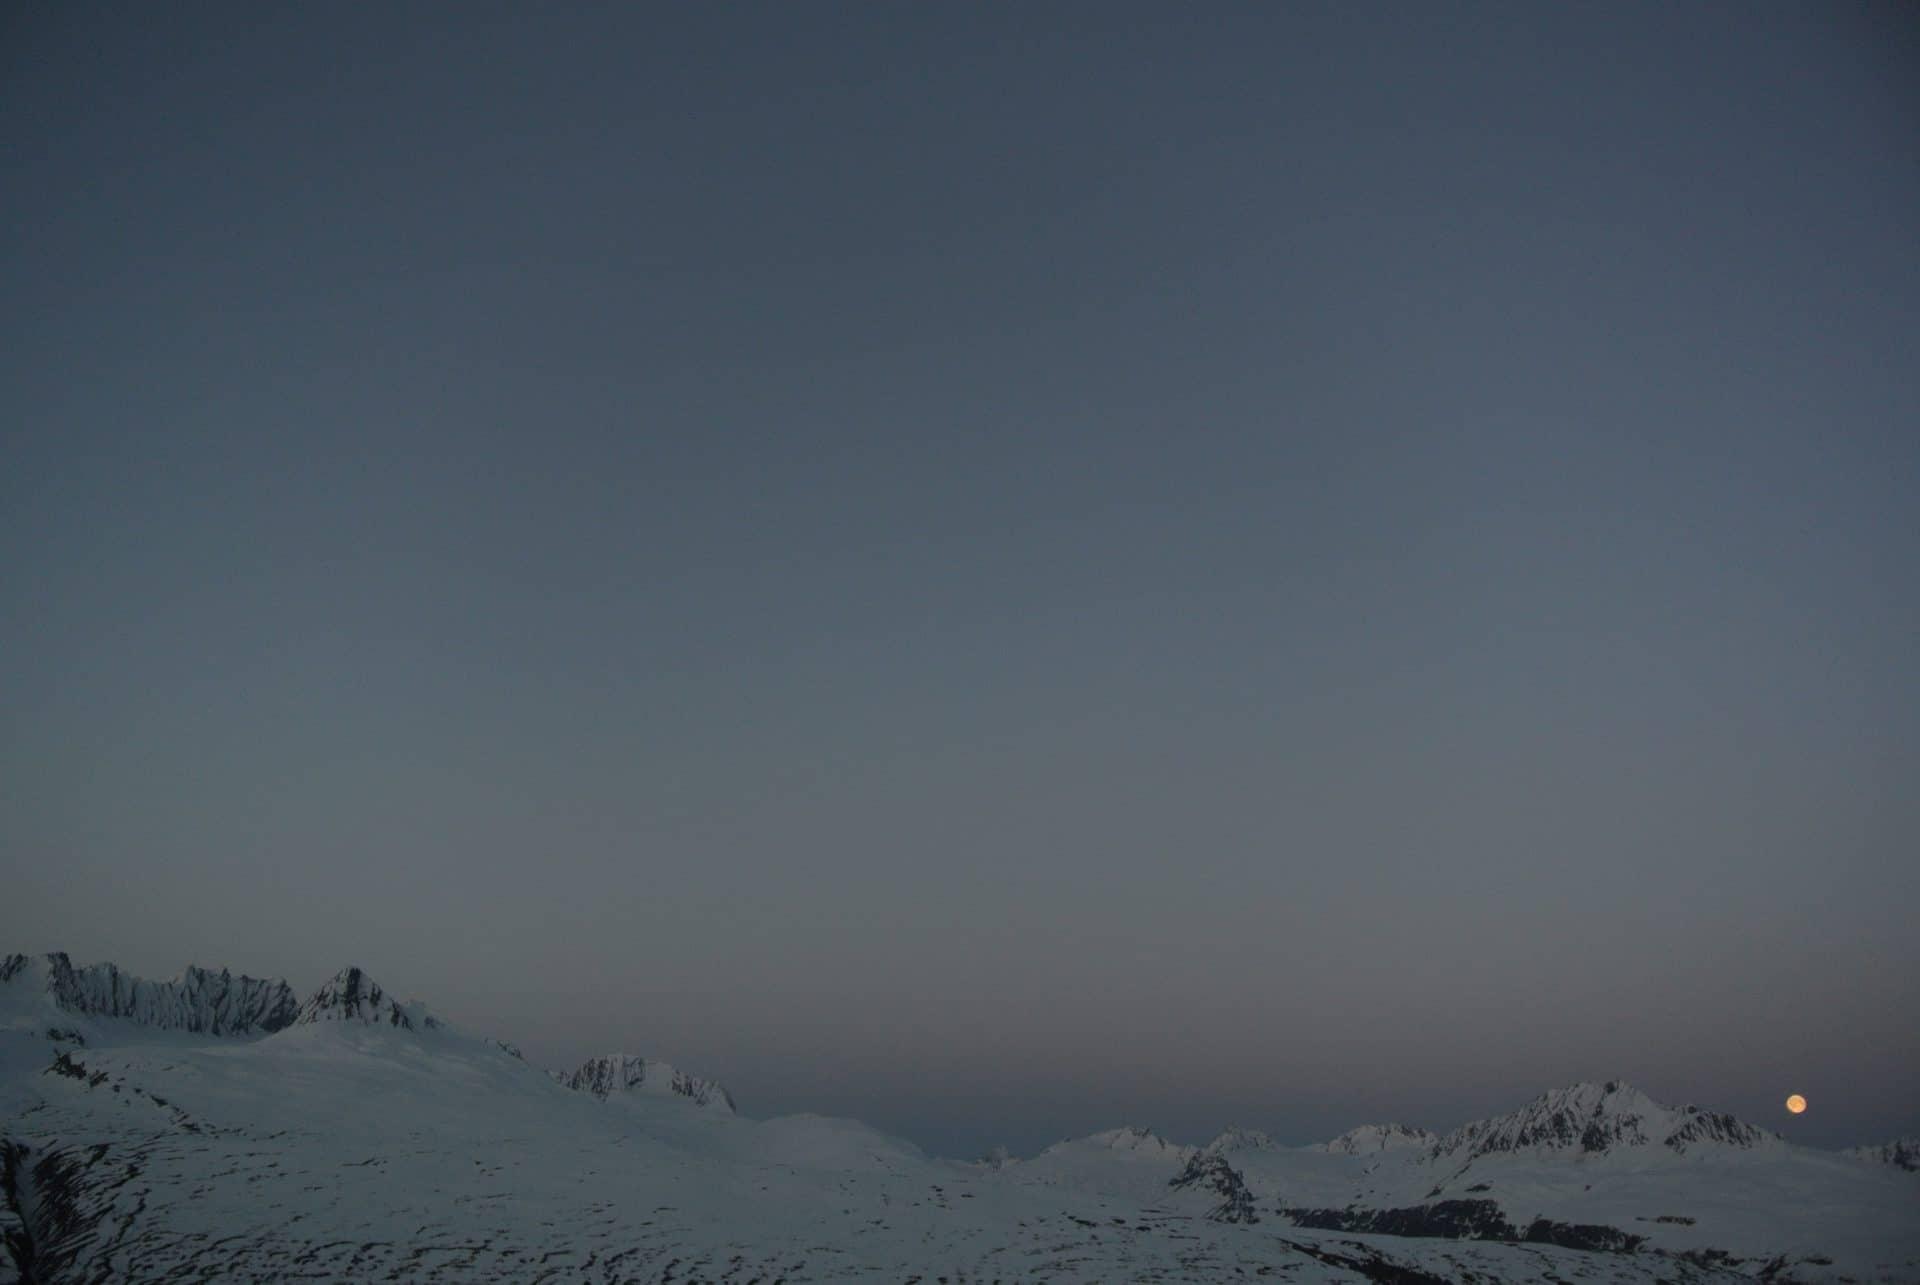 Helyum_Xavier-Carrard_Guide-de-montagne_Ski_Alaska_Ambiance_Lune